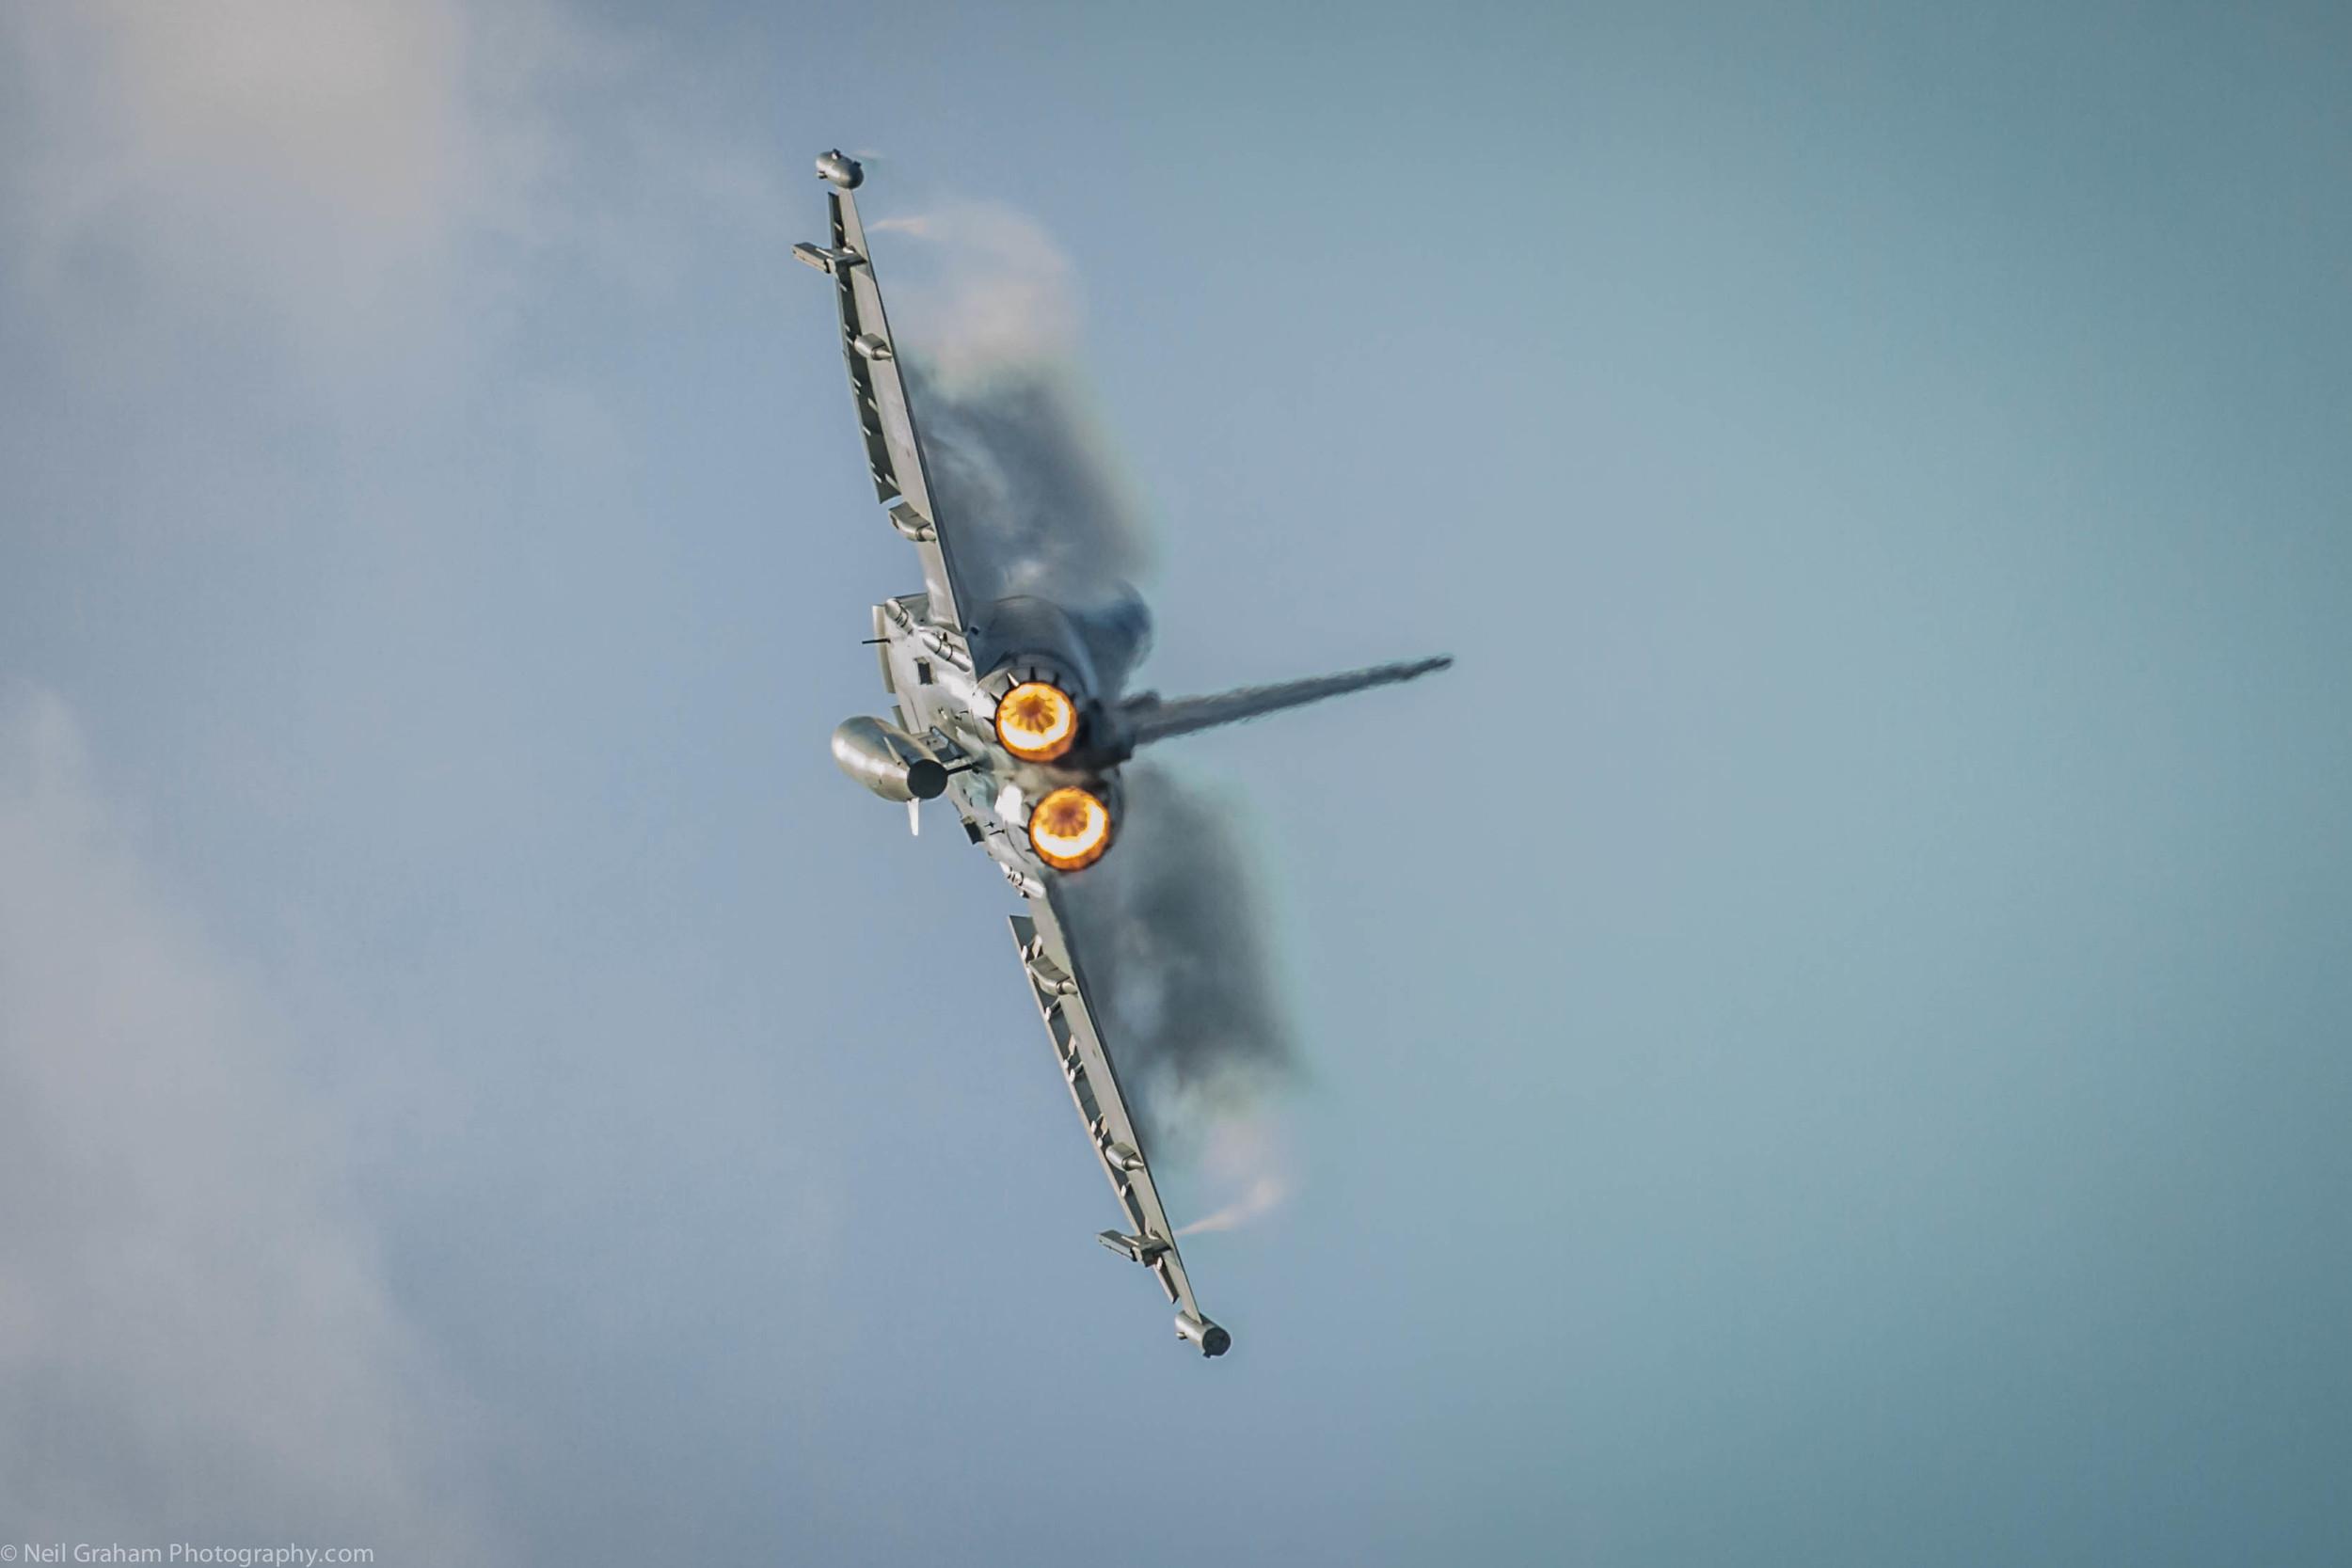 RAF Typhoon Display Team